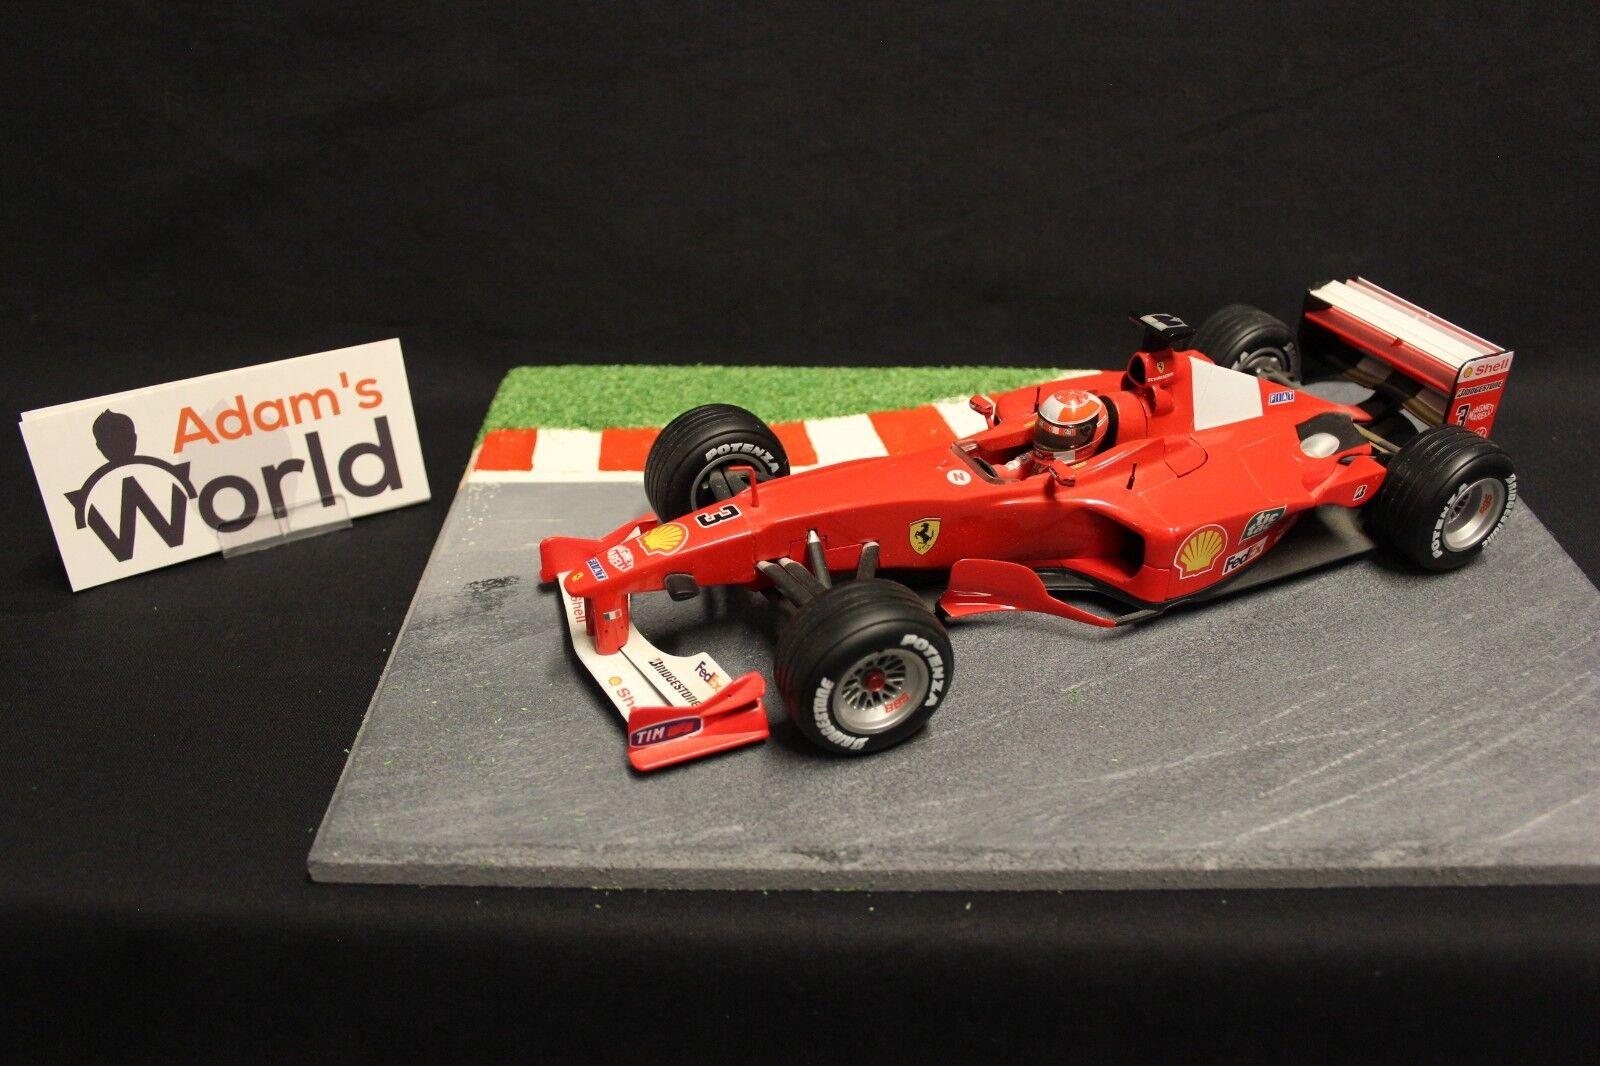 Hot Wheels Ferrari F-2000 2000 1 18 Michael Schumacher (GER) (F1NB)